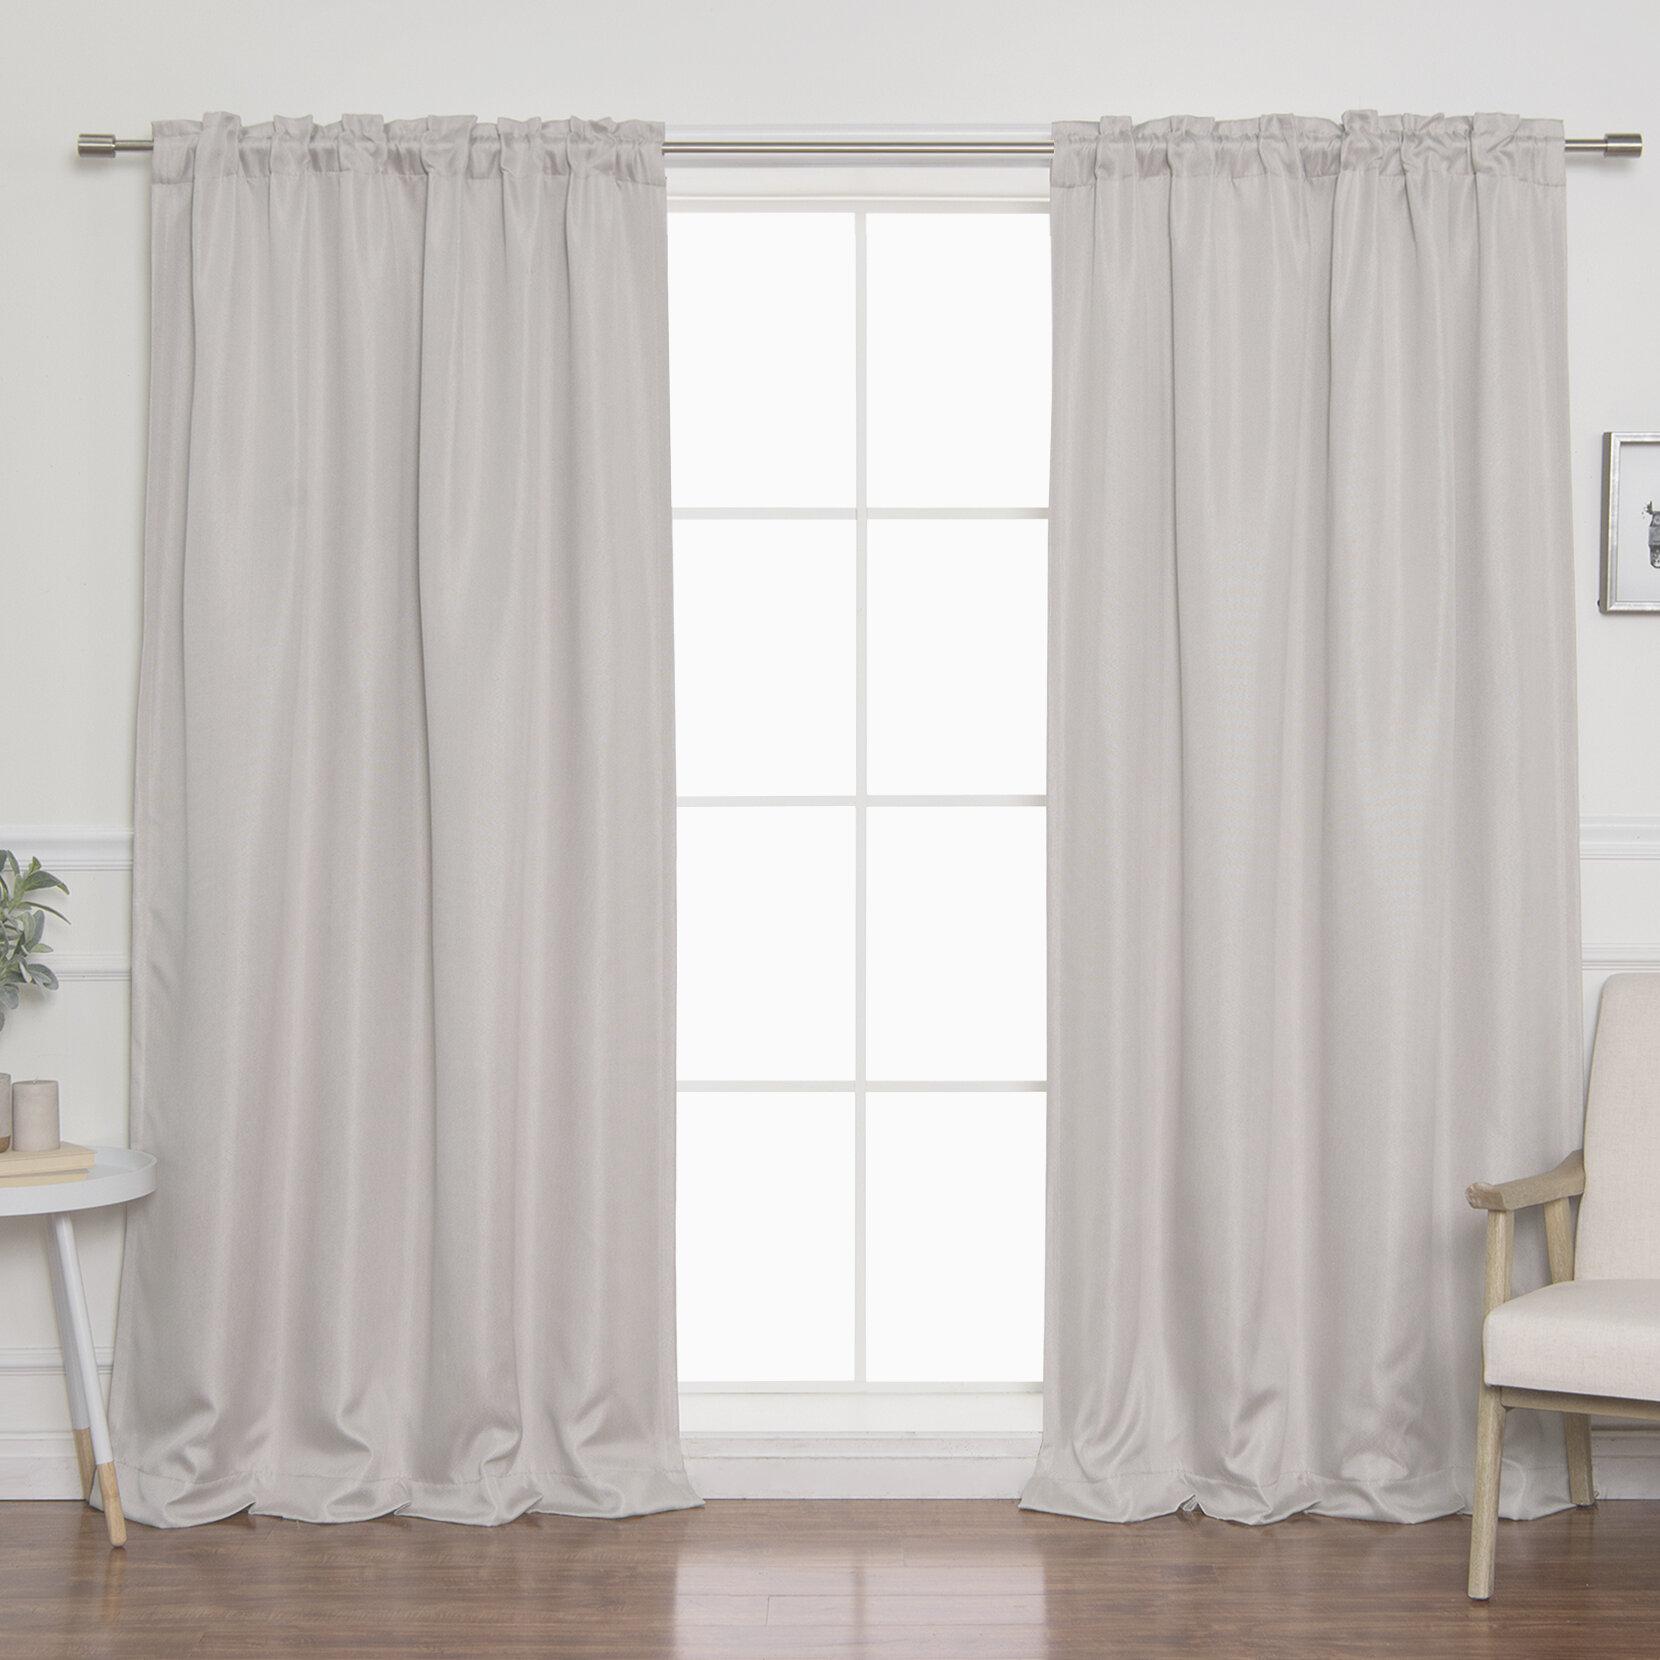 Vicenta Basketweave Faux Linen Solid Blackout Back Tab Top Curtain Panels Reviews Joss Main